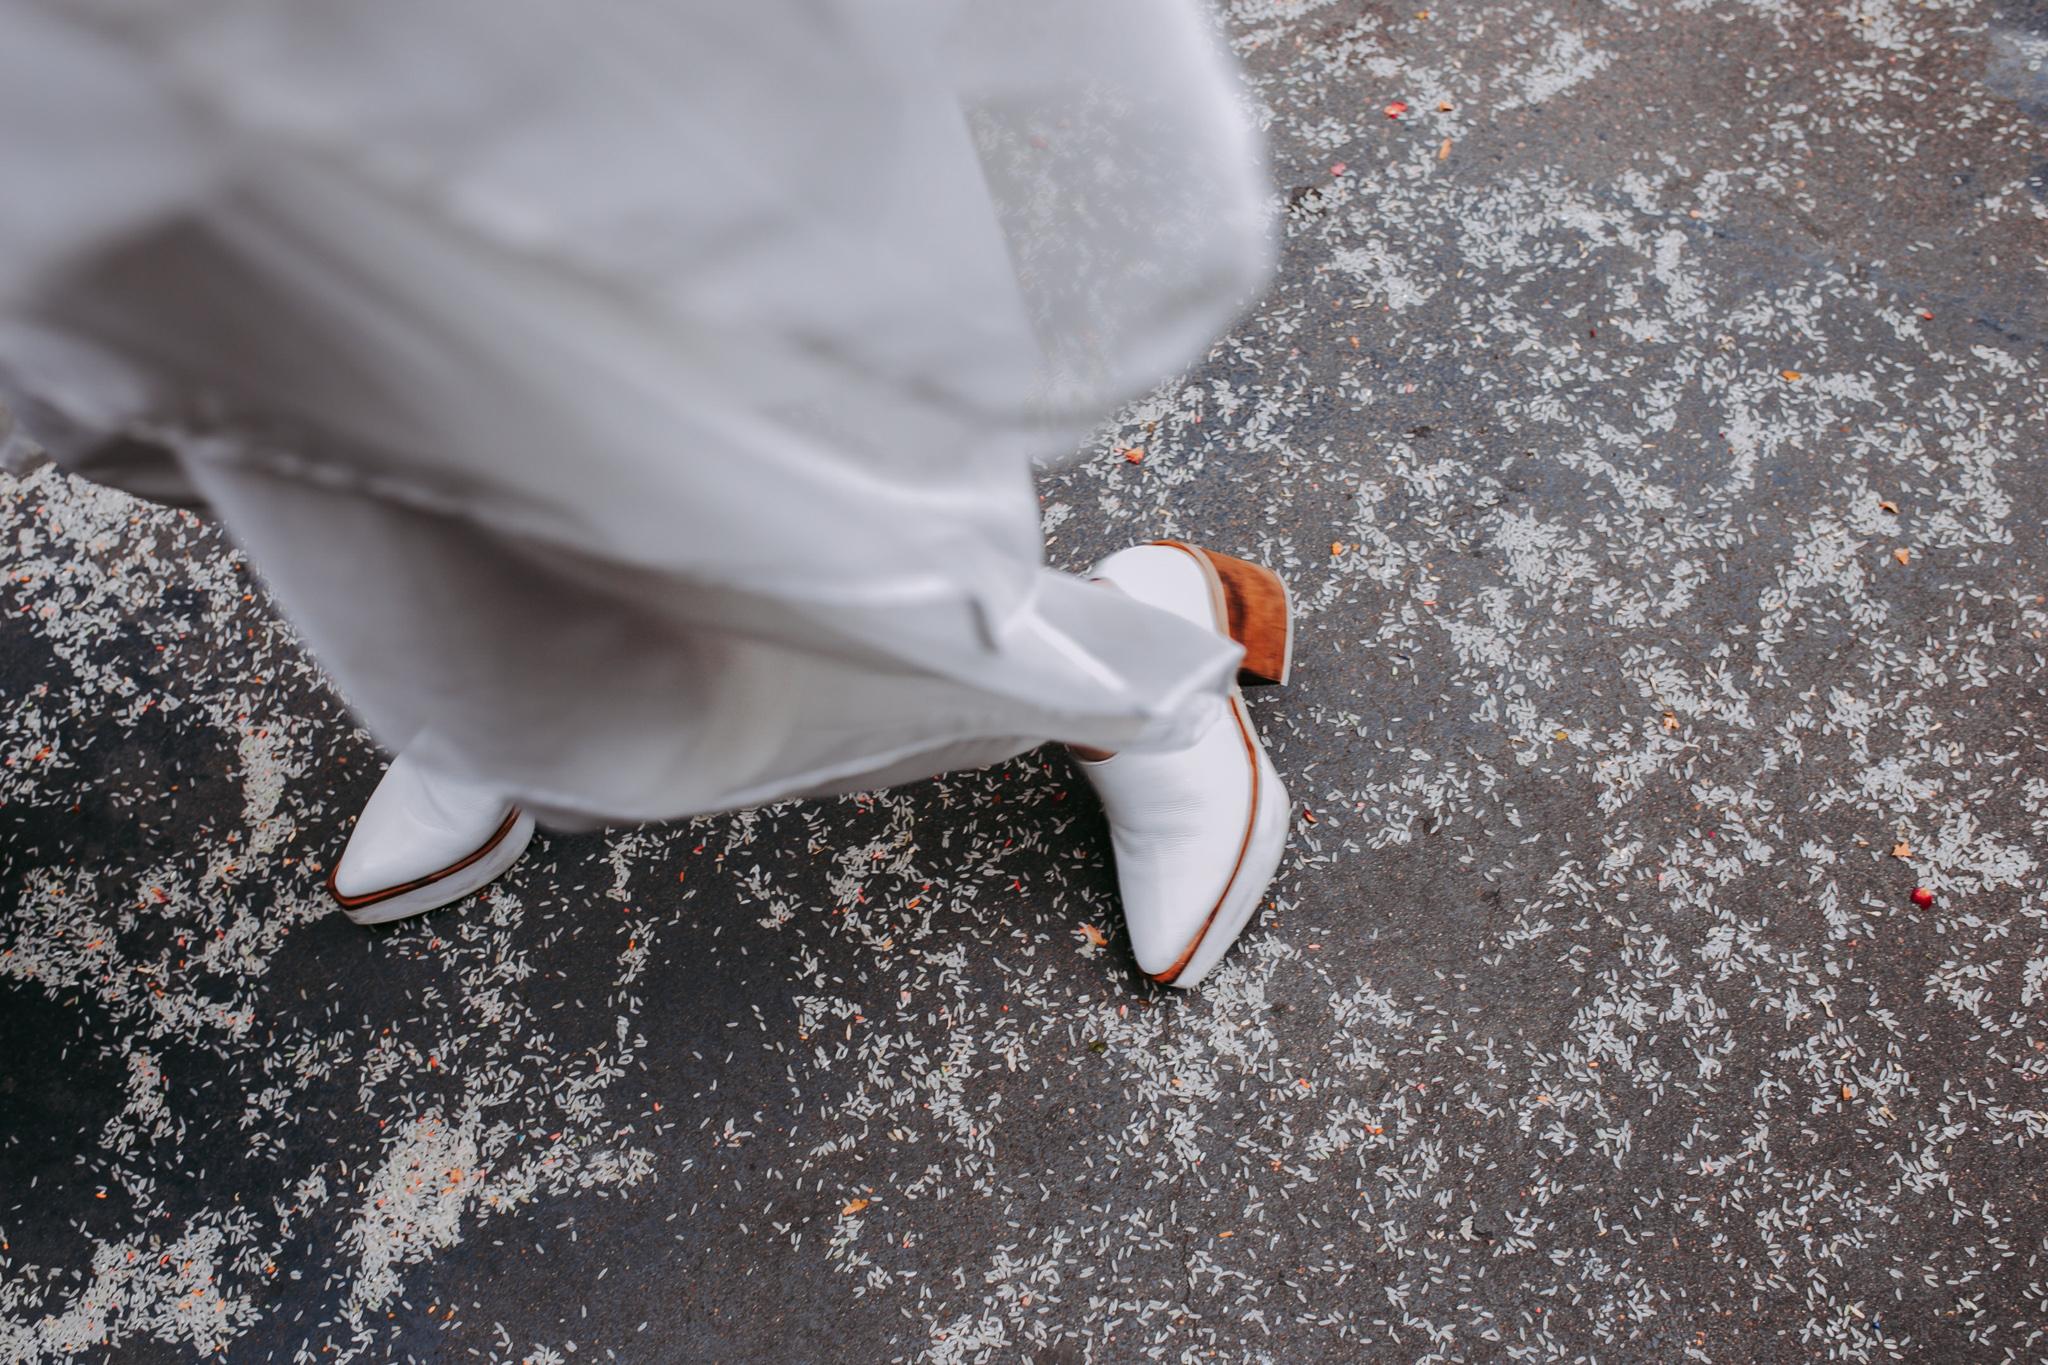 Montevideo Punta del Este Villa Domus La Hacienda Carrasco Yacht Jacksonville Vestido de novia Maquillaje de novia Peinado de novia Zapatos de novia Tocado de novia